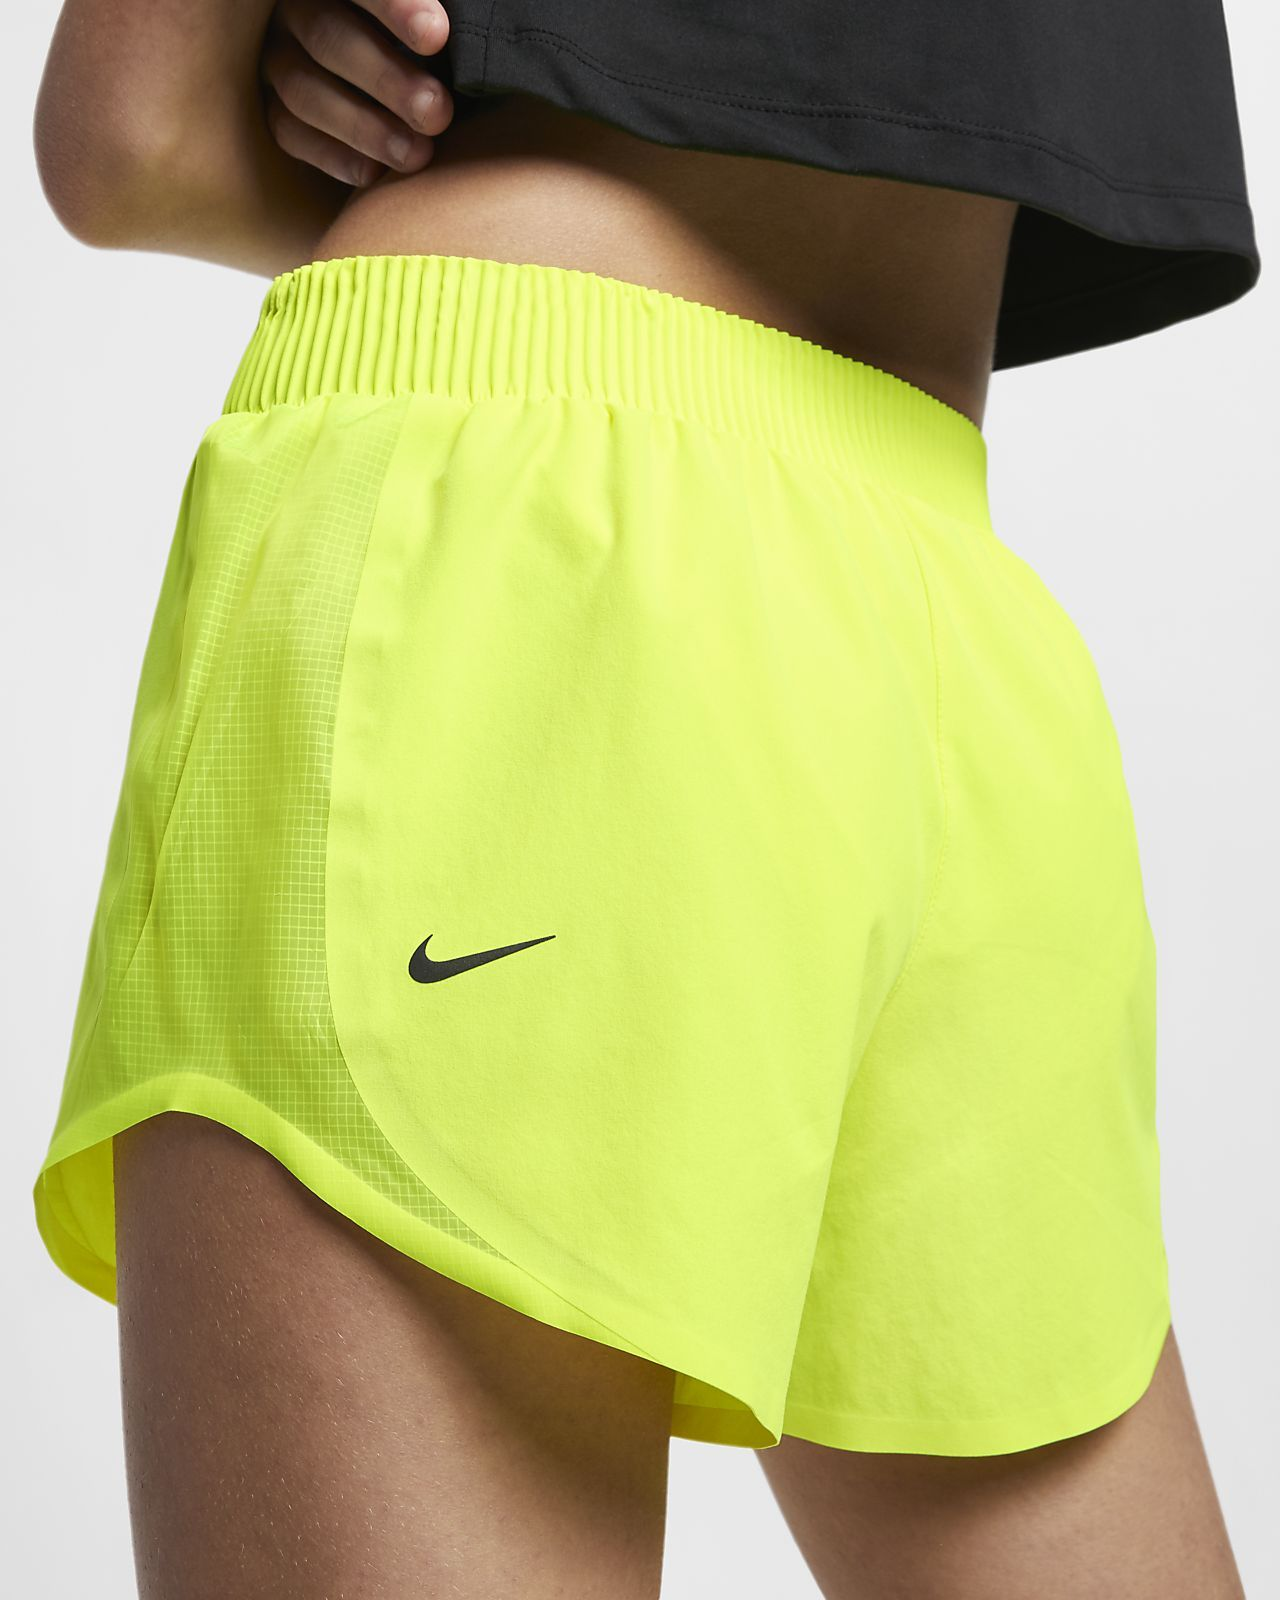 3586f1ddfebad Tempo Women's Running Shorts in 2019   ~⭕️❌   Nike shorts women ...